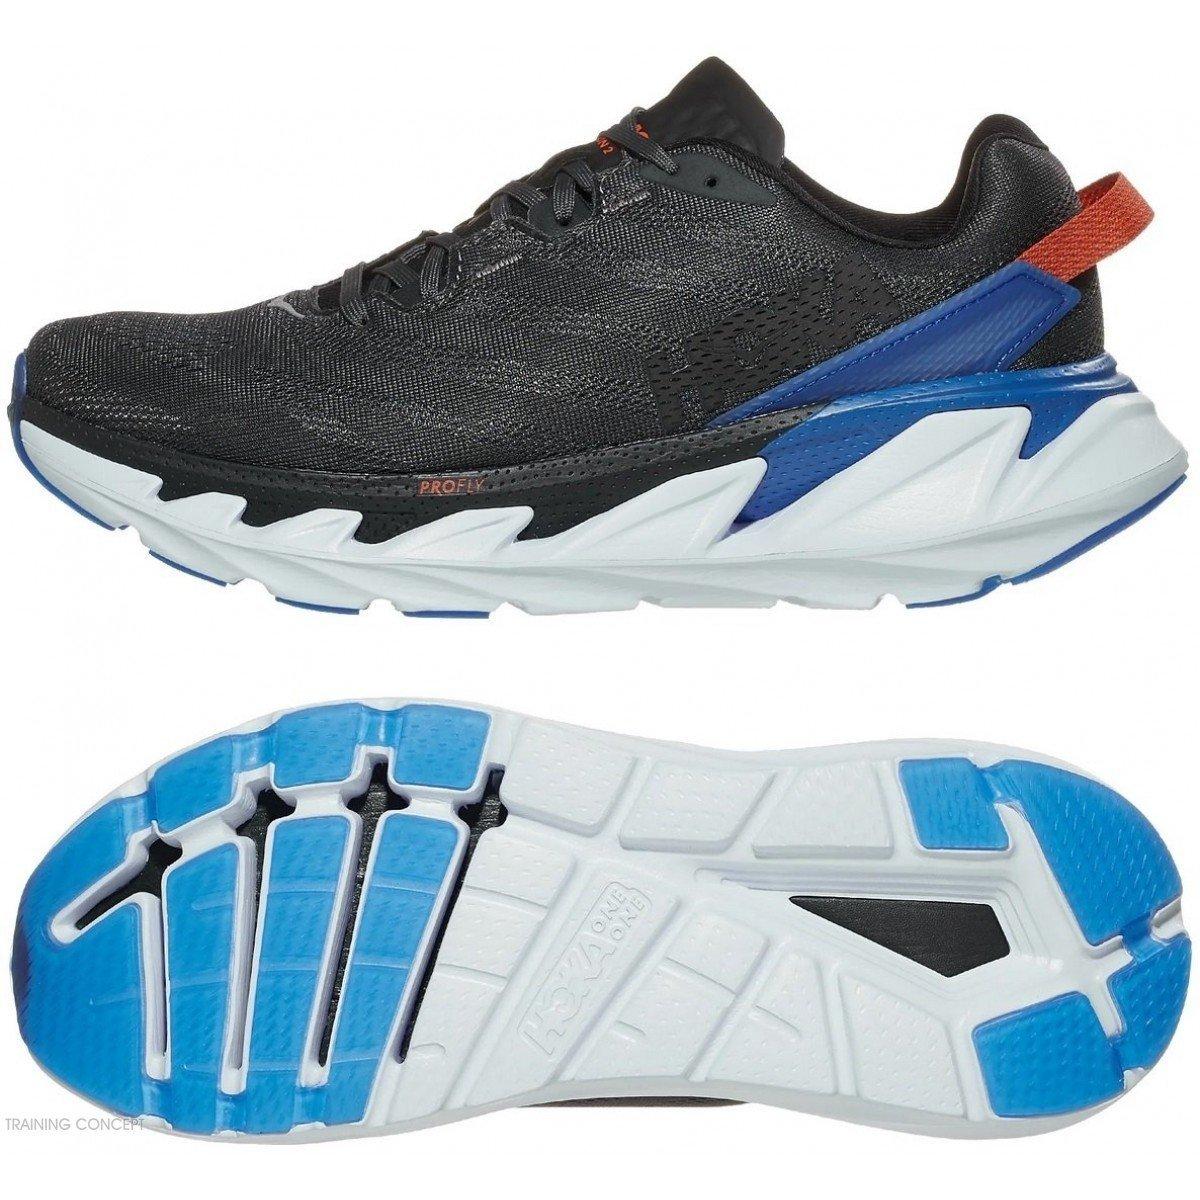 De Femme Running Hoka Pour Chaussure Elevon b7yYfg6v